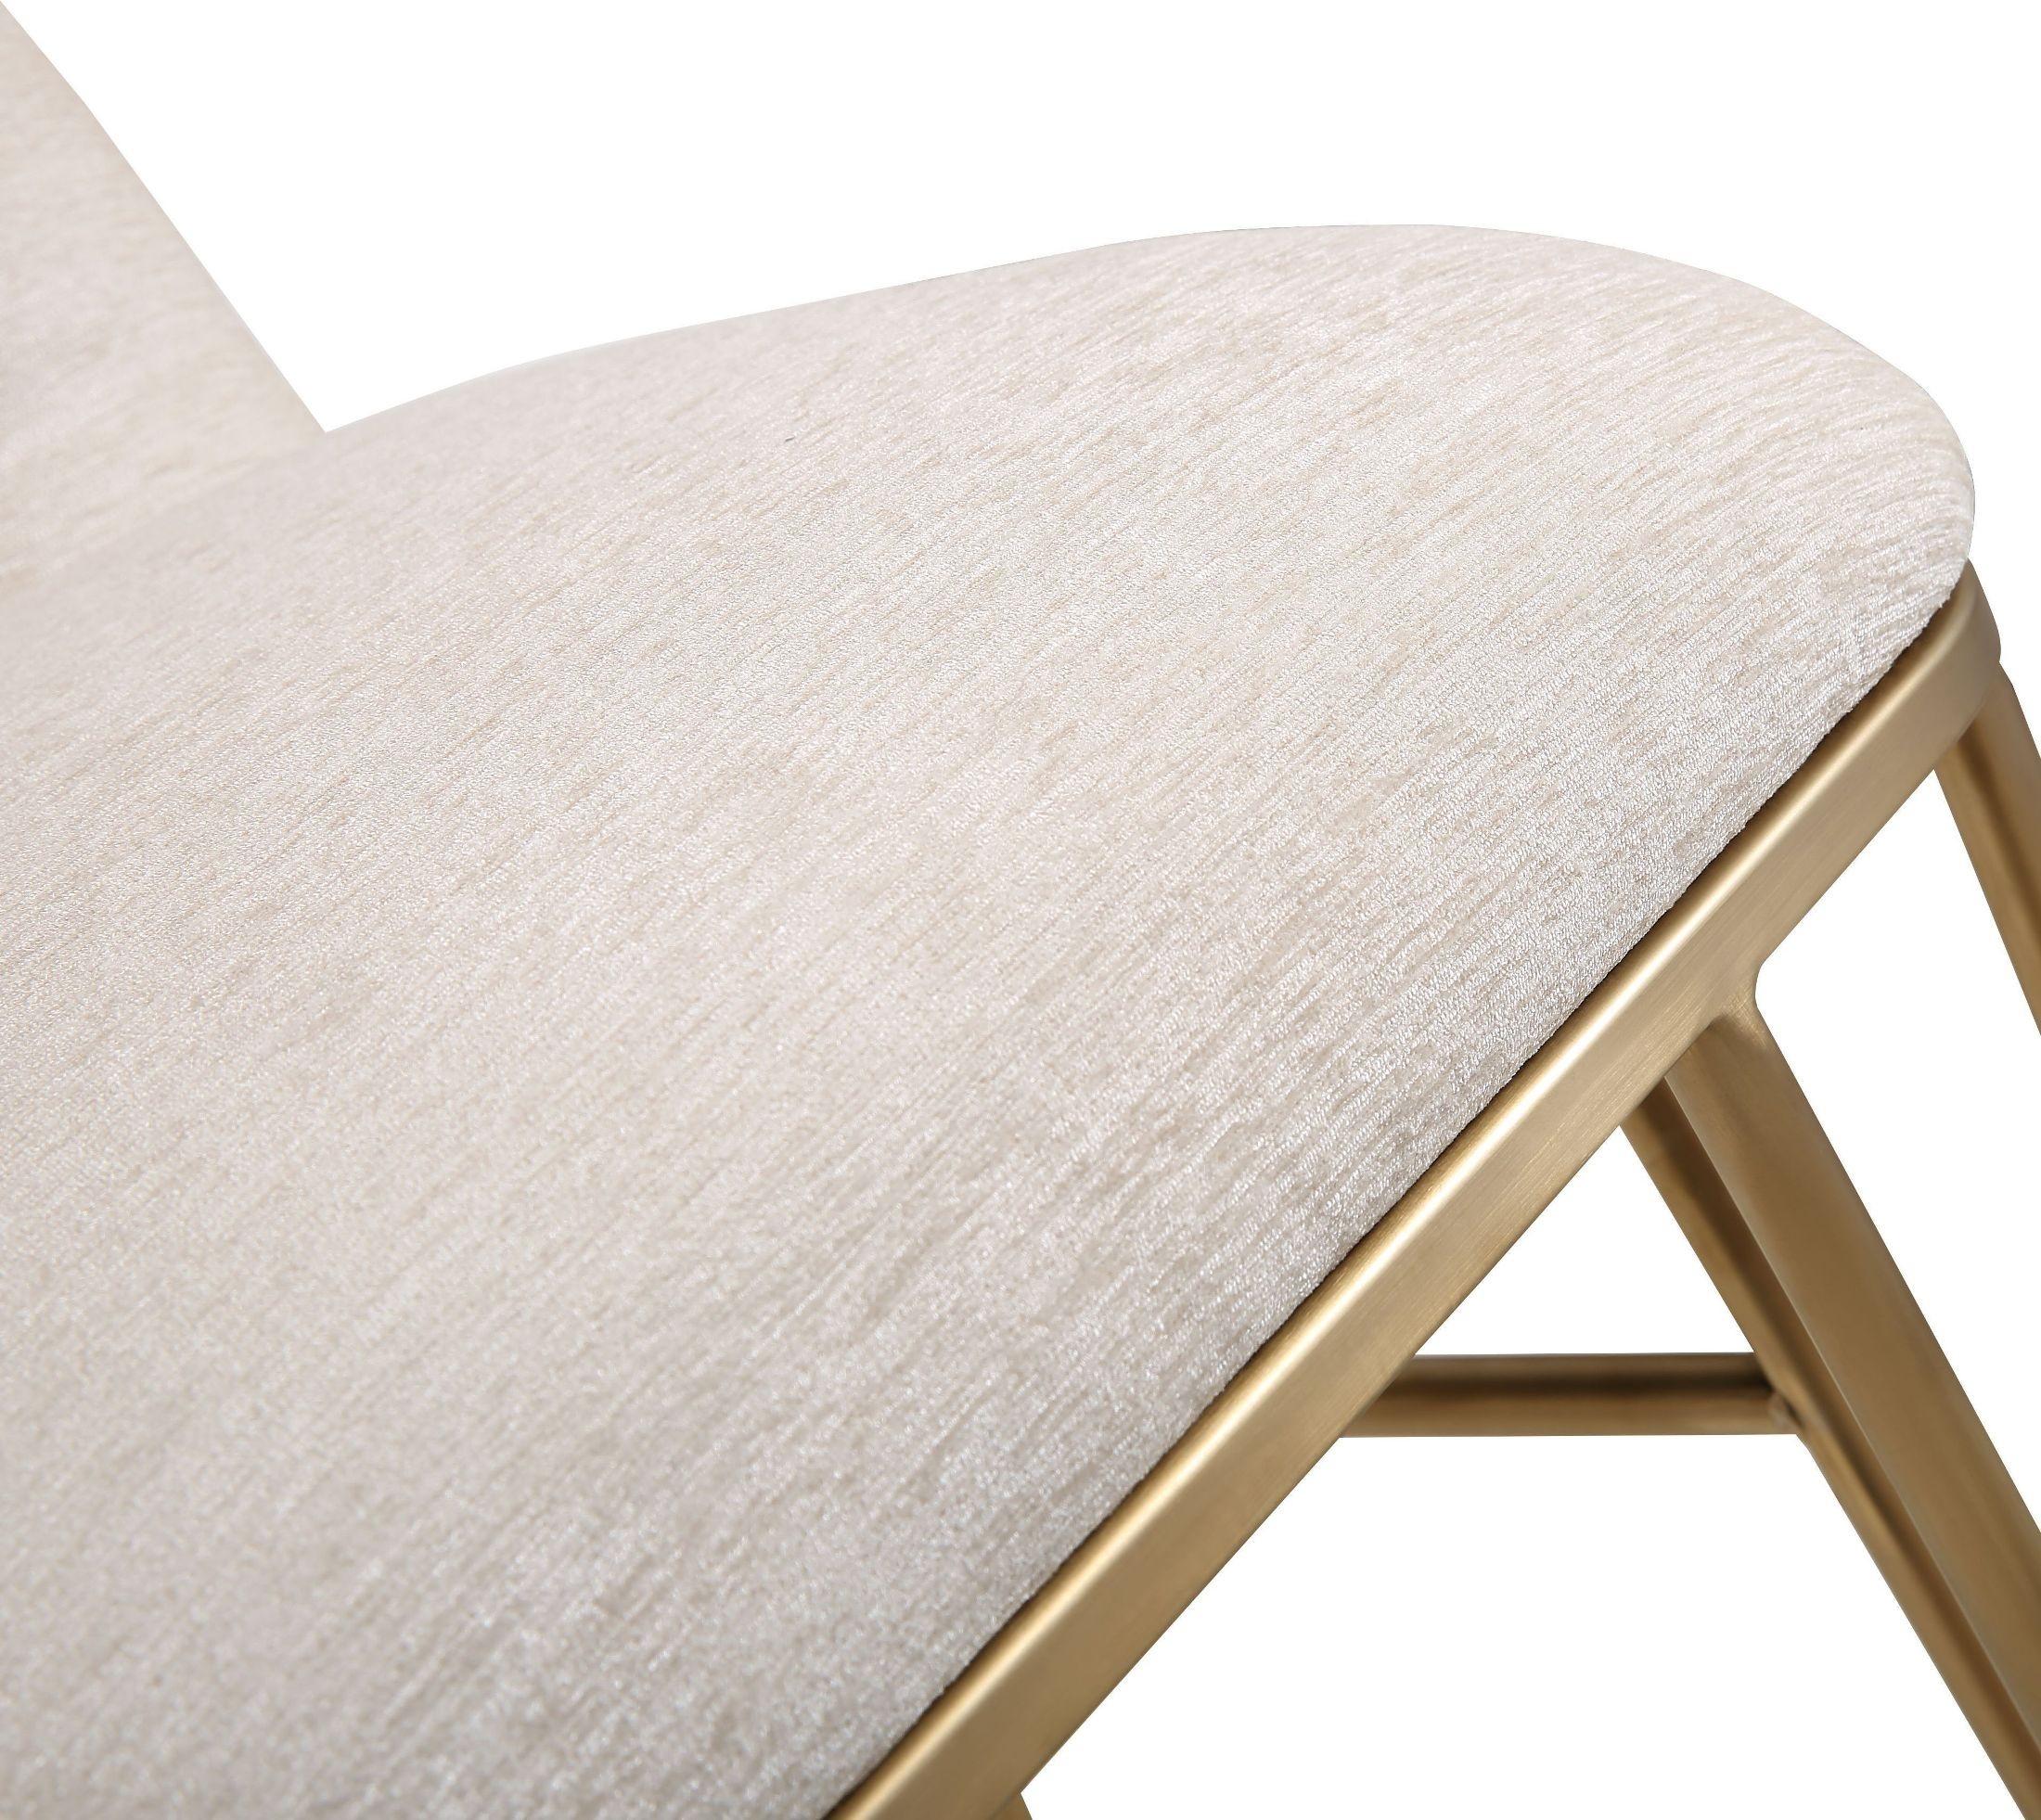 Lexi Cream Textured Velvet Bar Stool D3730 TOV Furniture : tov d37307tov from colemanfurniture.com size 2200 x 1962 jpeg 726kB